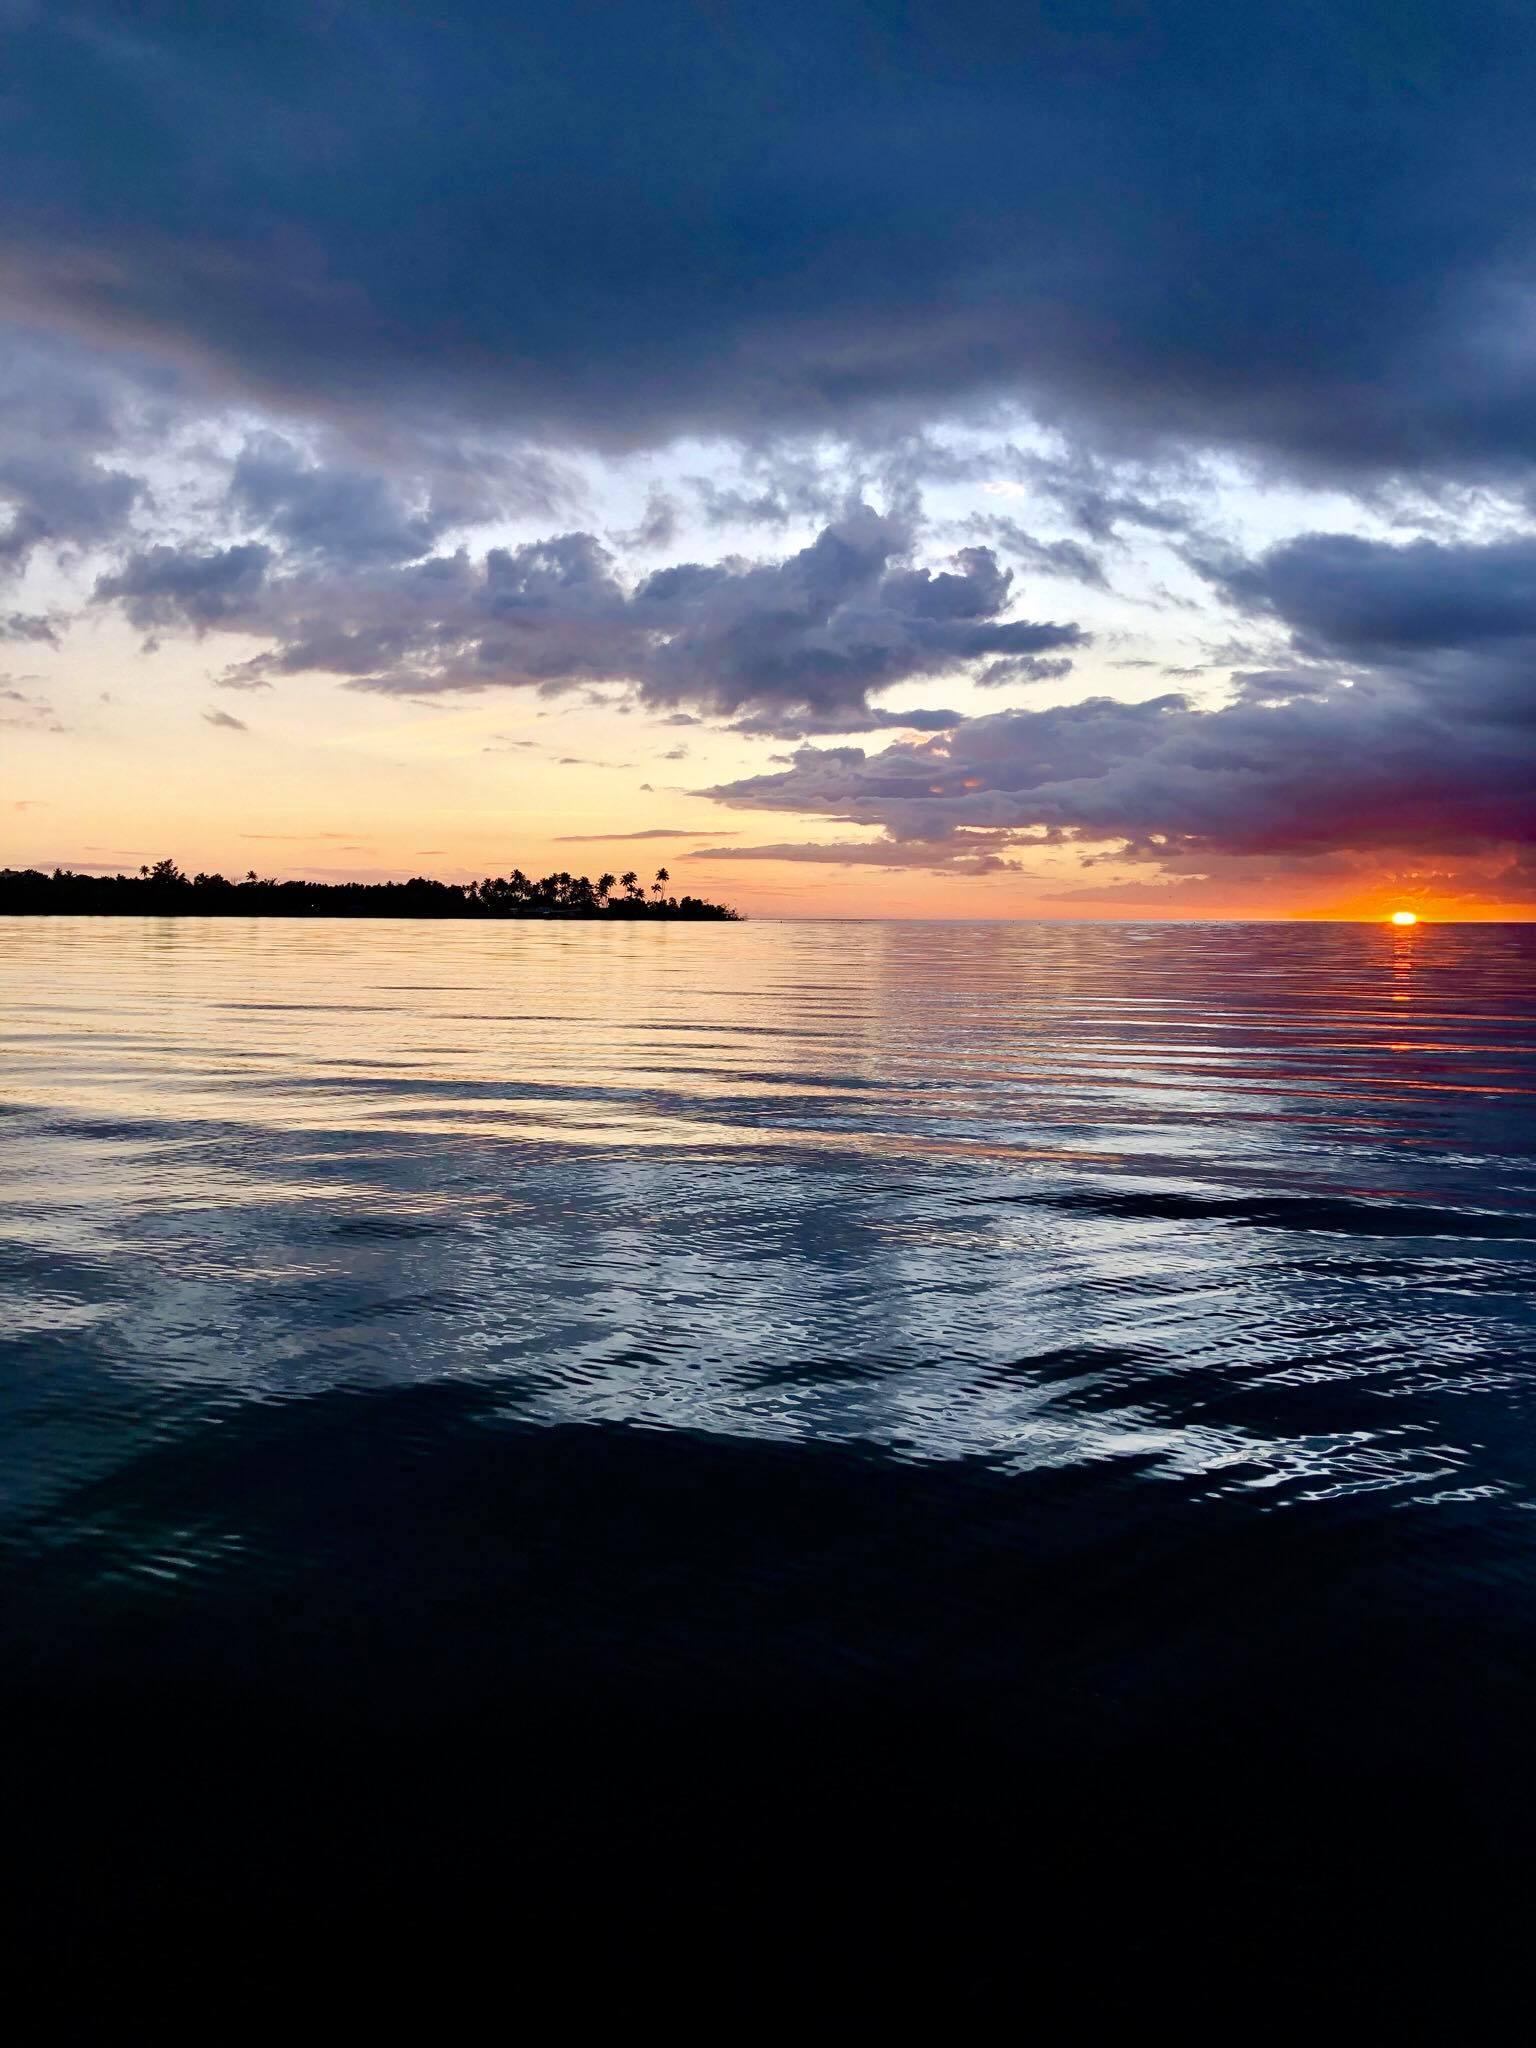 Sailing Life Day 309 Sailing (actually motoring) from Puerto Real to Boqueron, Puerto Rico9.jpg